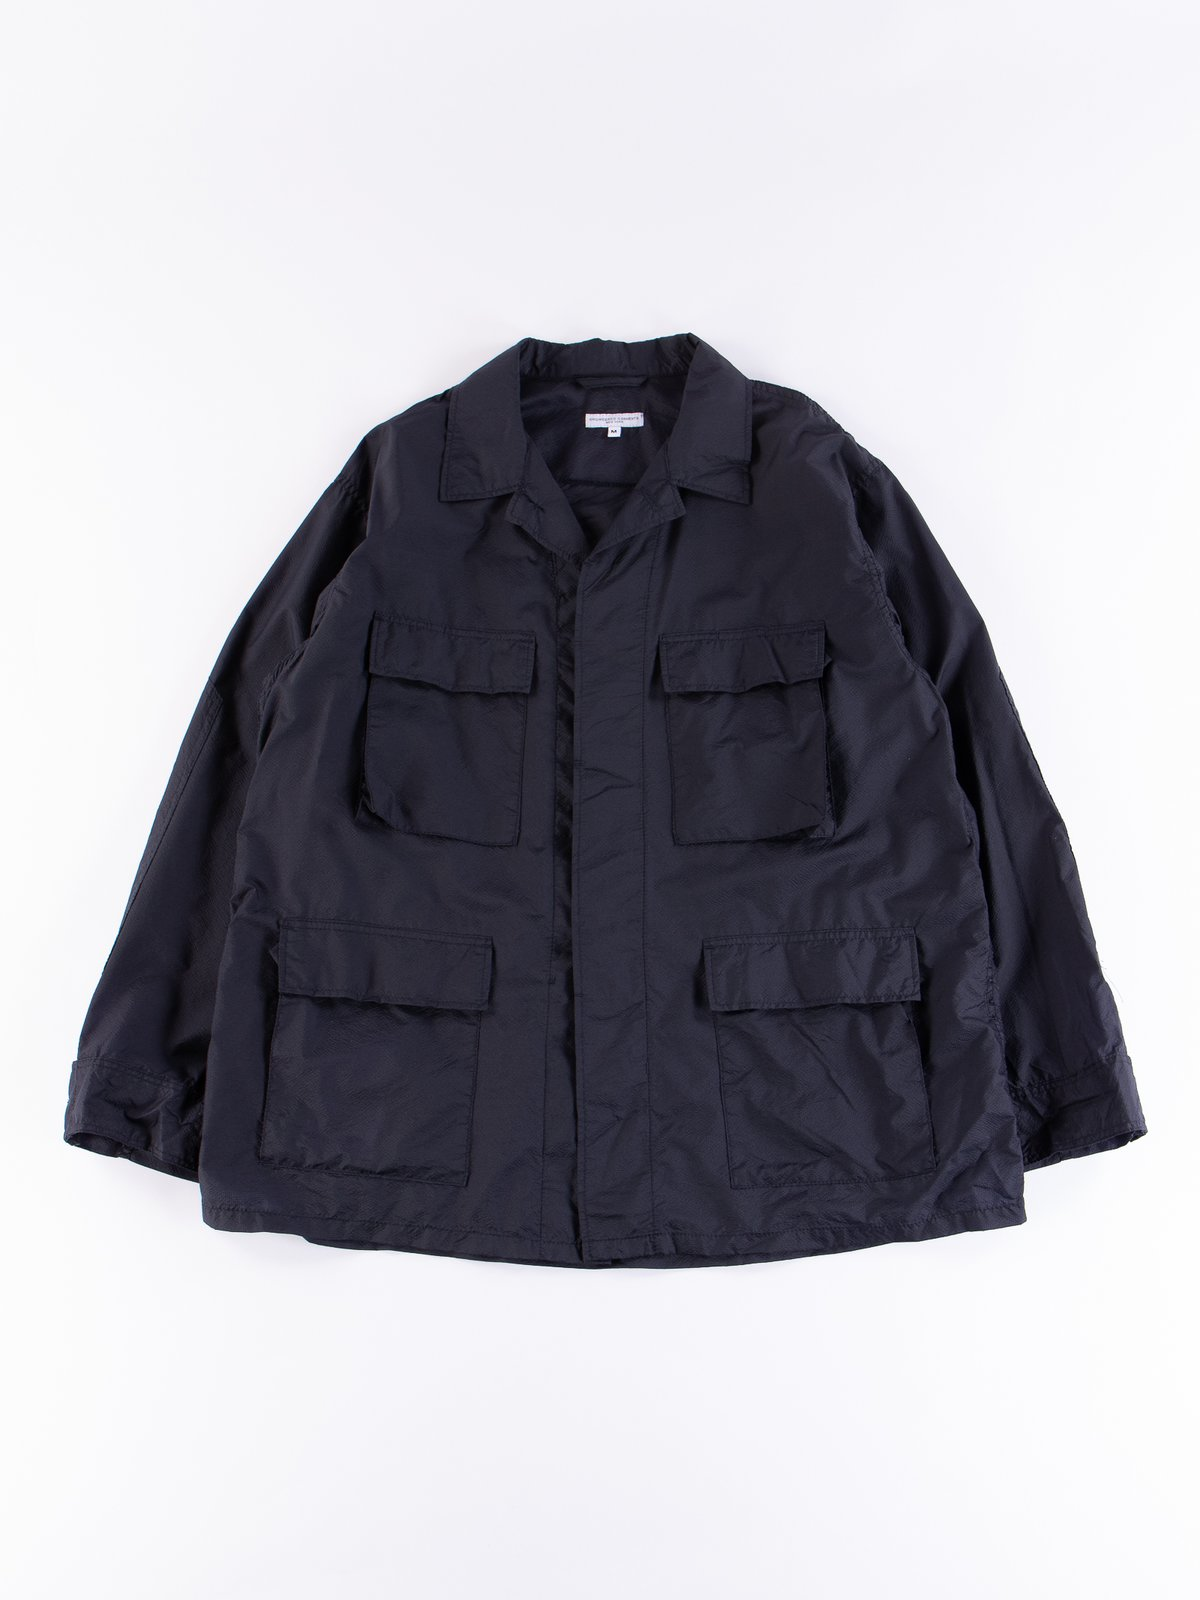 Dark Navy Nylon Micro Ripstop BDU Jacket - Image 1